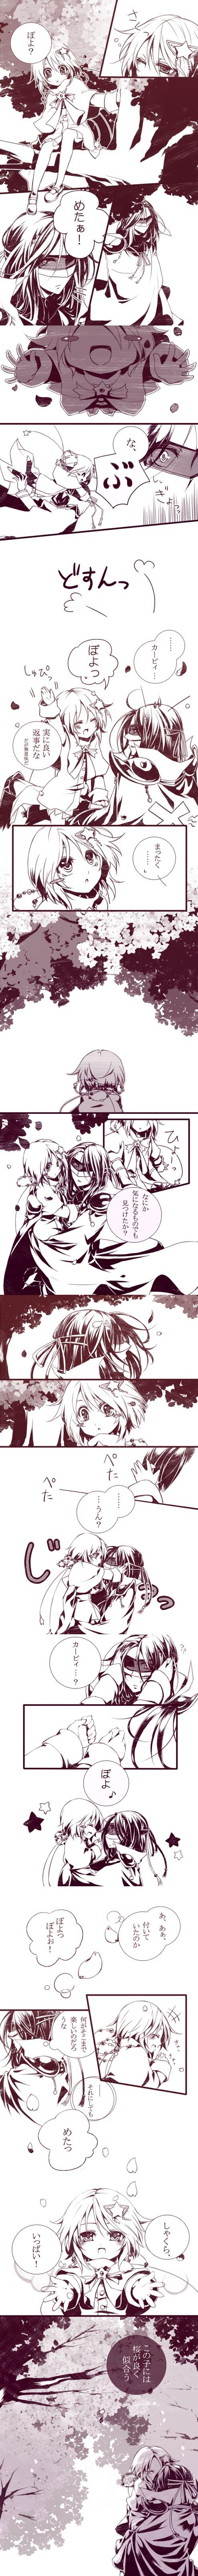 Translation Request   page 3 of 403 - Zerochan Anime Image Board